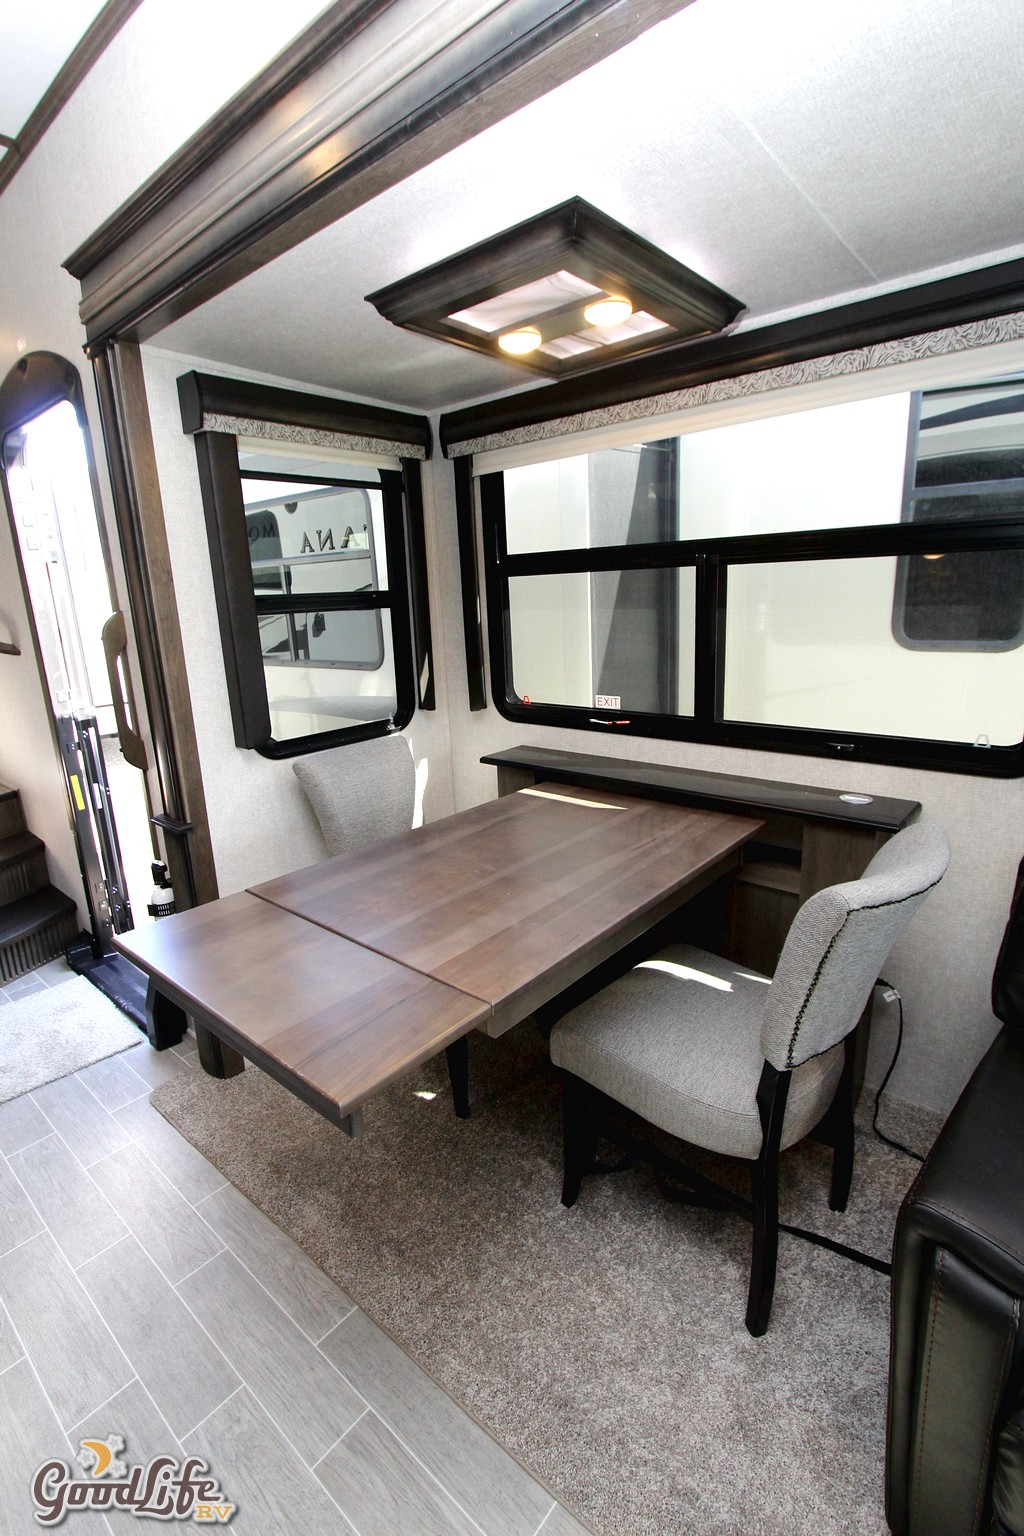 2020 Keystone Montana 3121RL Fifth Wheel  Good Life RV